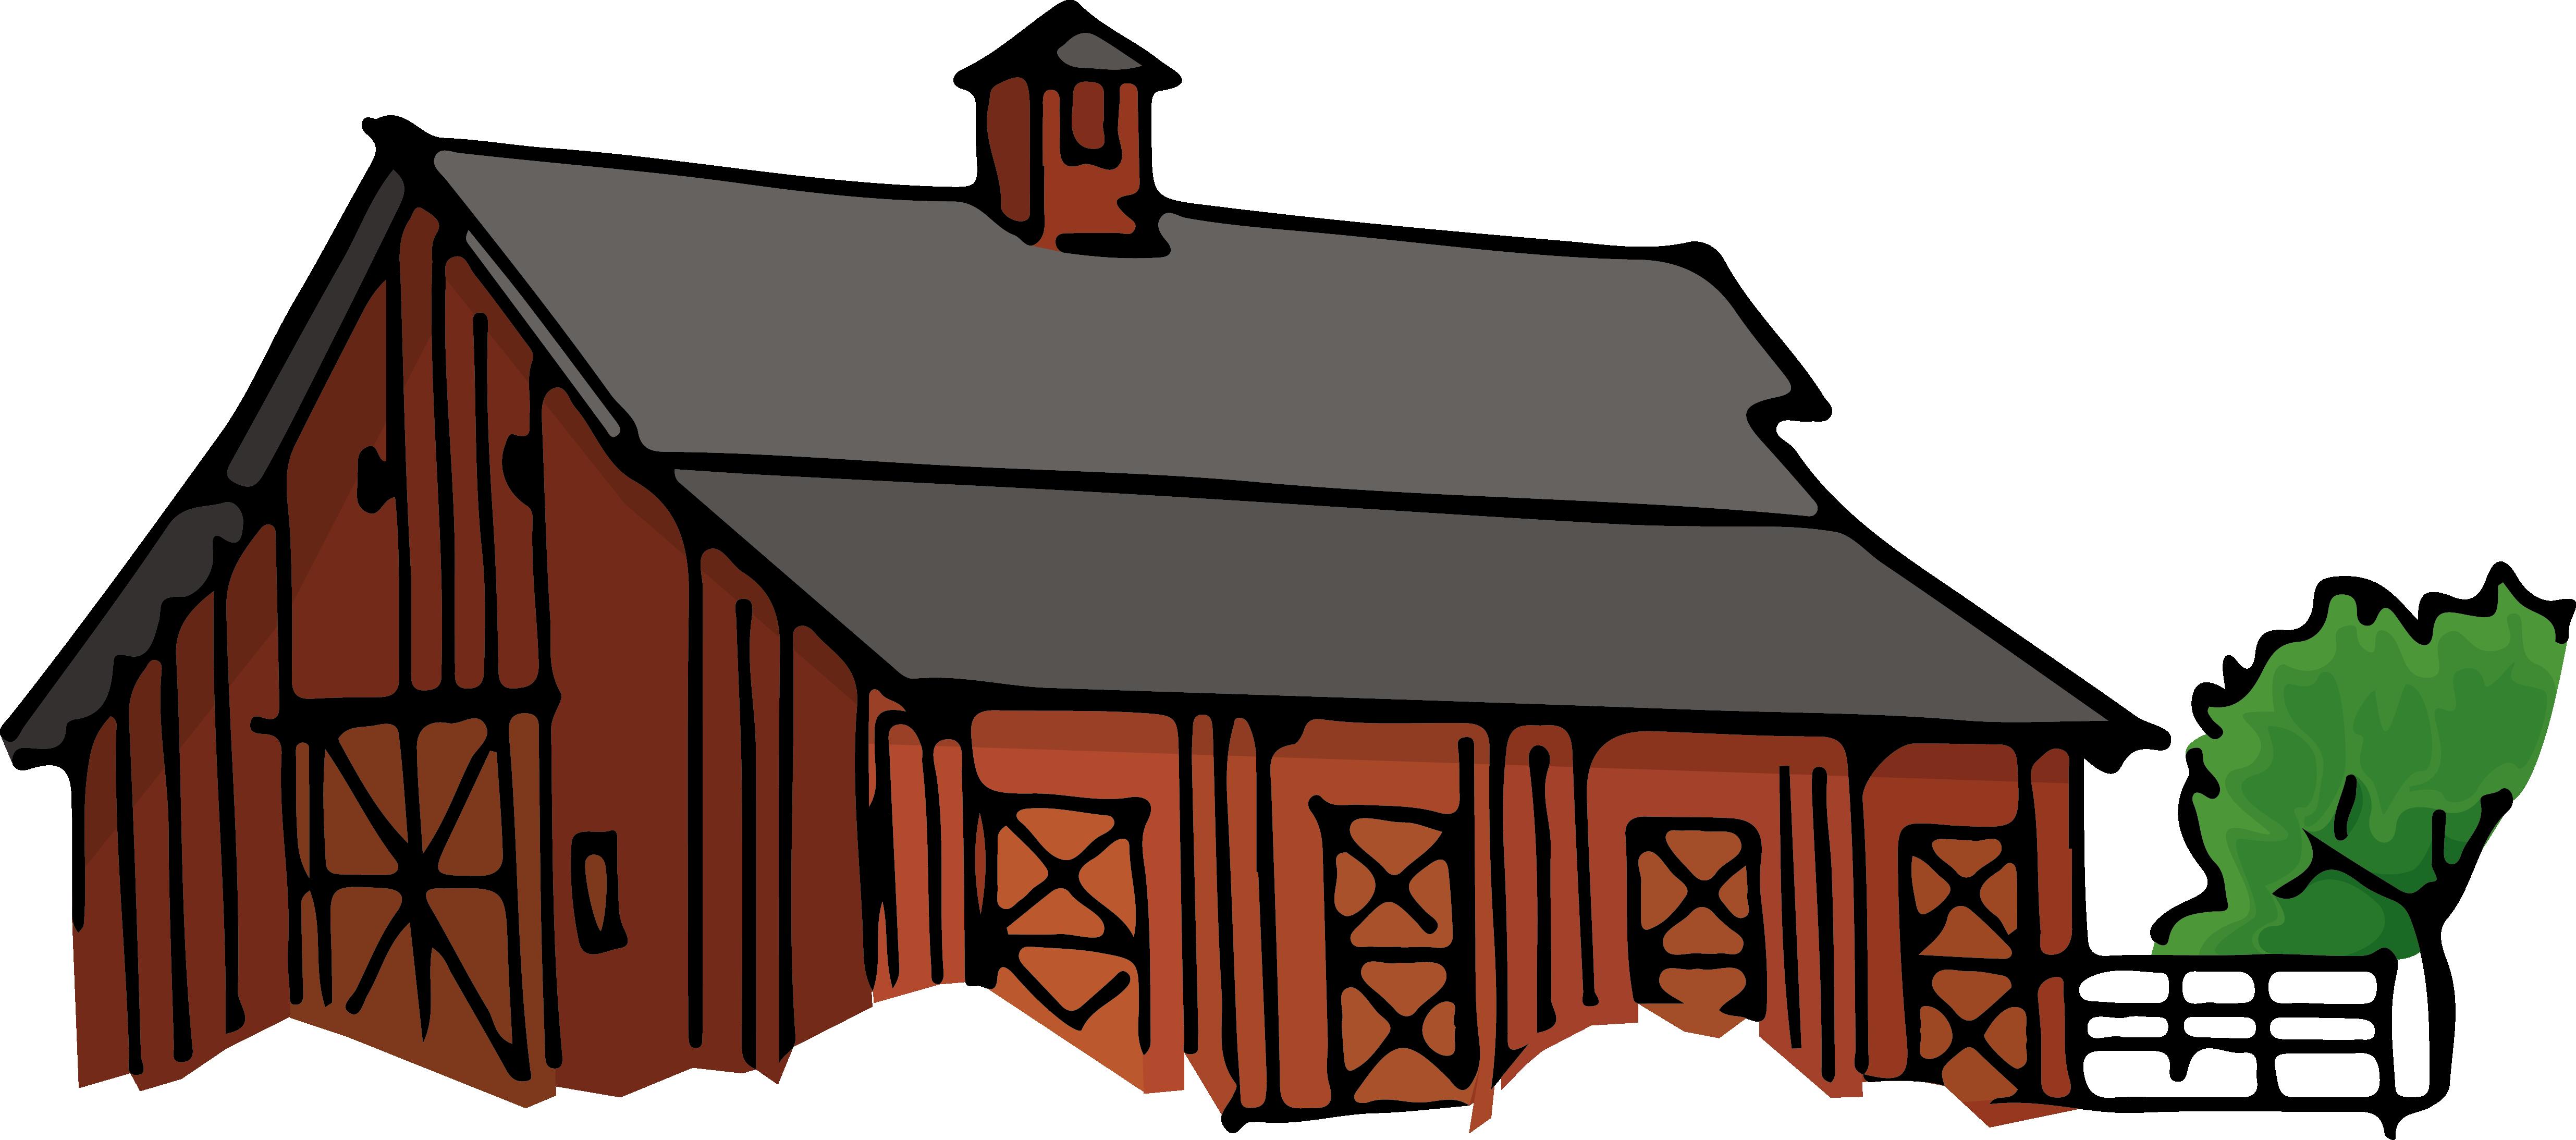 Clipart barn different building. Farmhouse clip art png